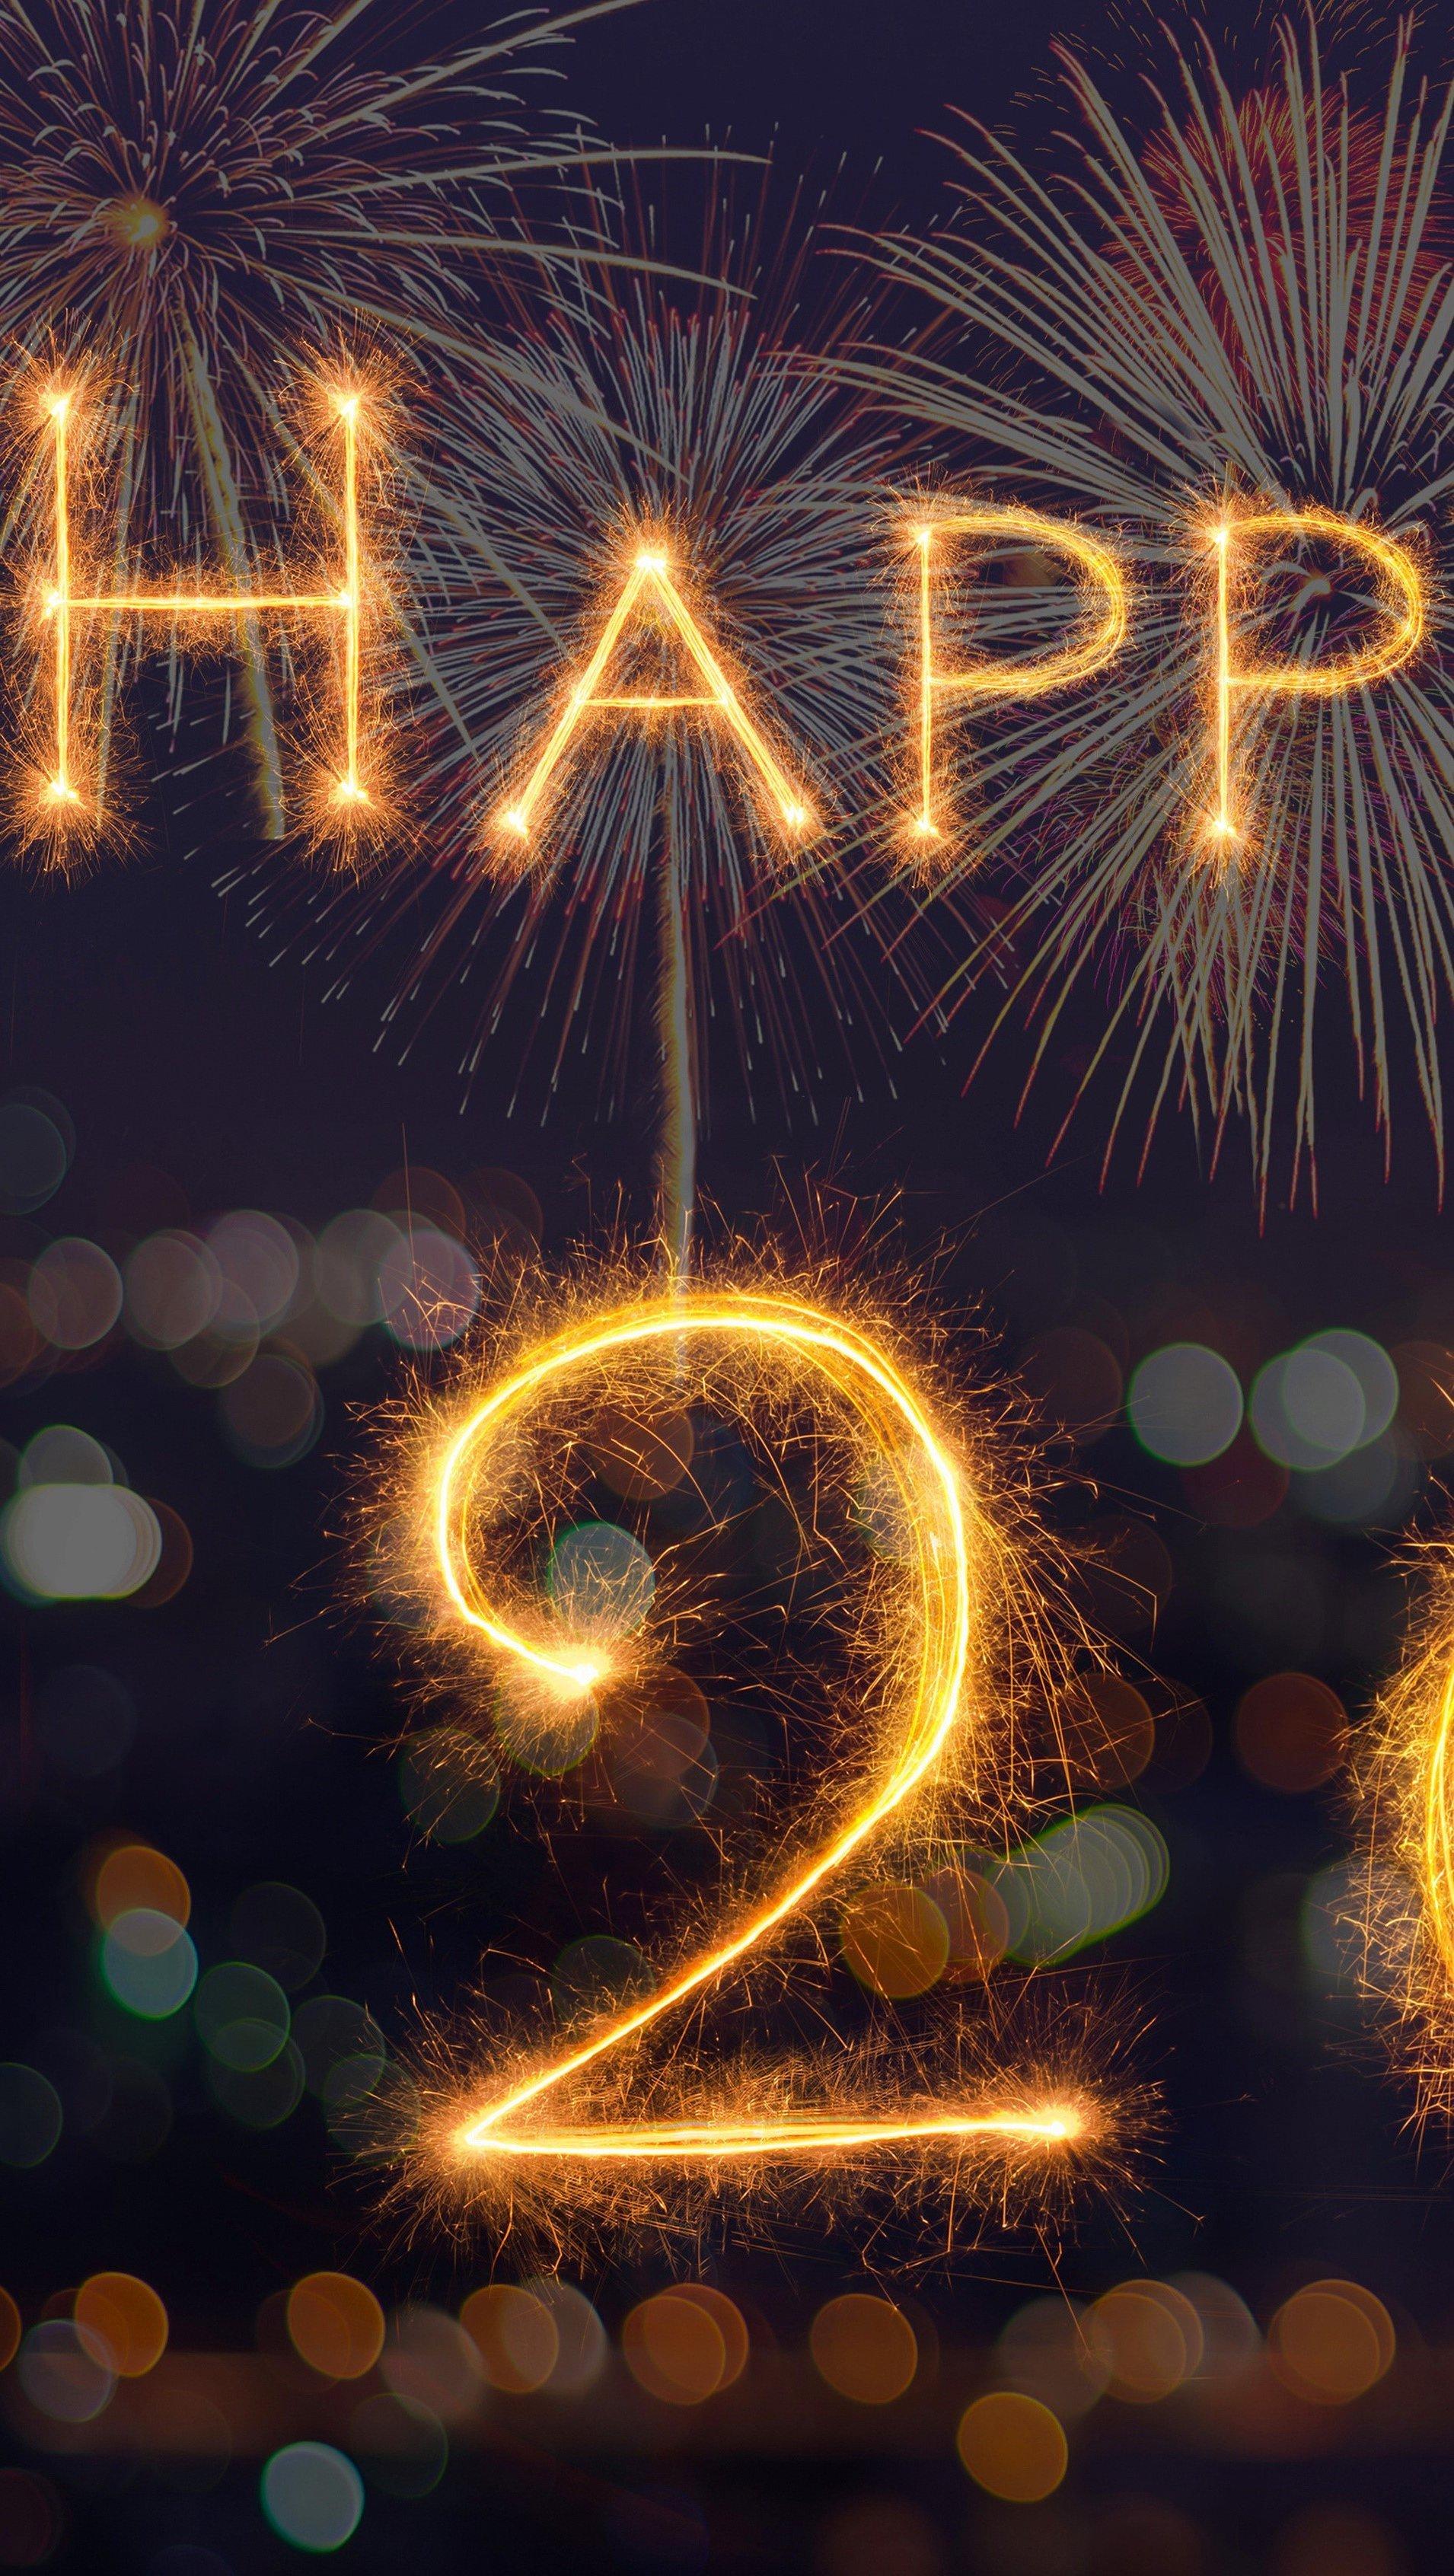 Wallpaper Happy New Year 2017 Vertical